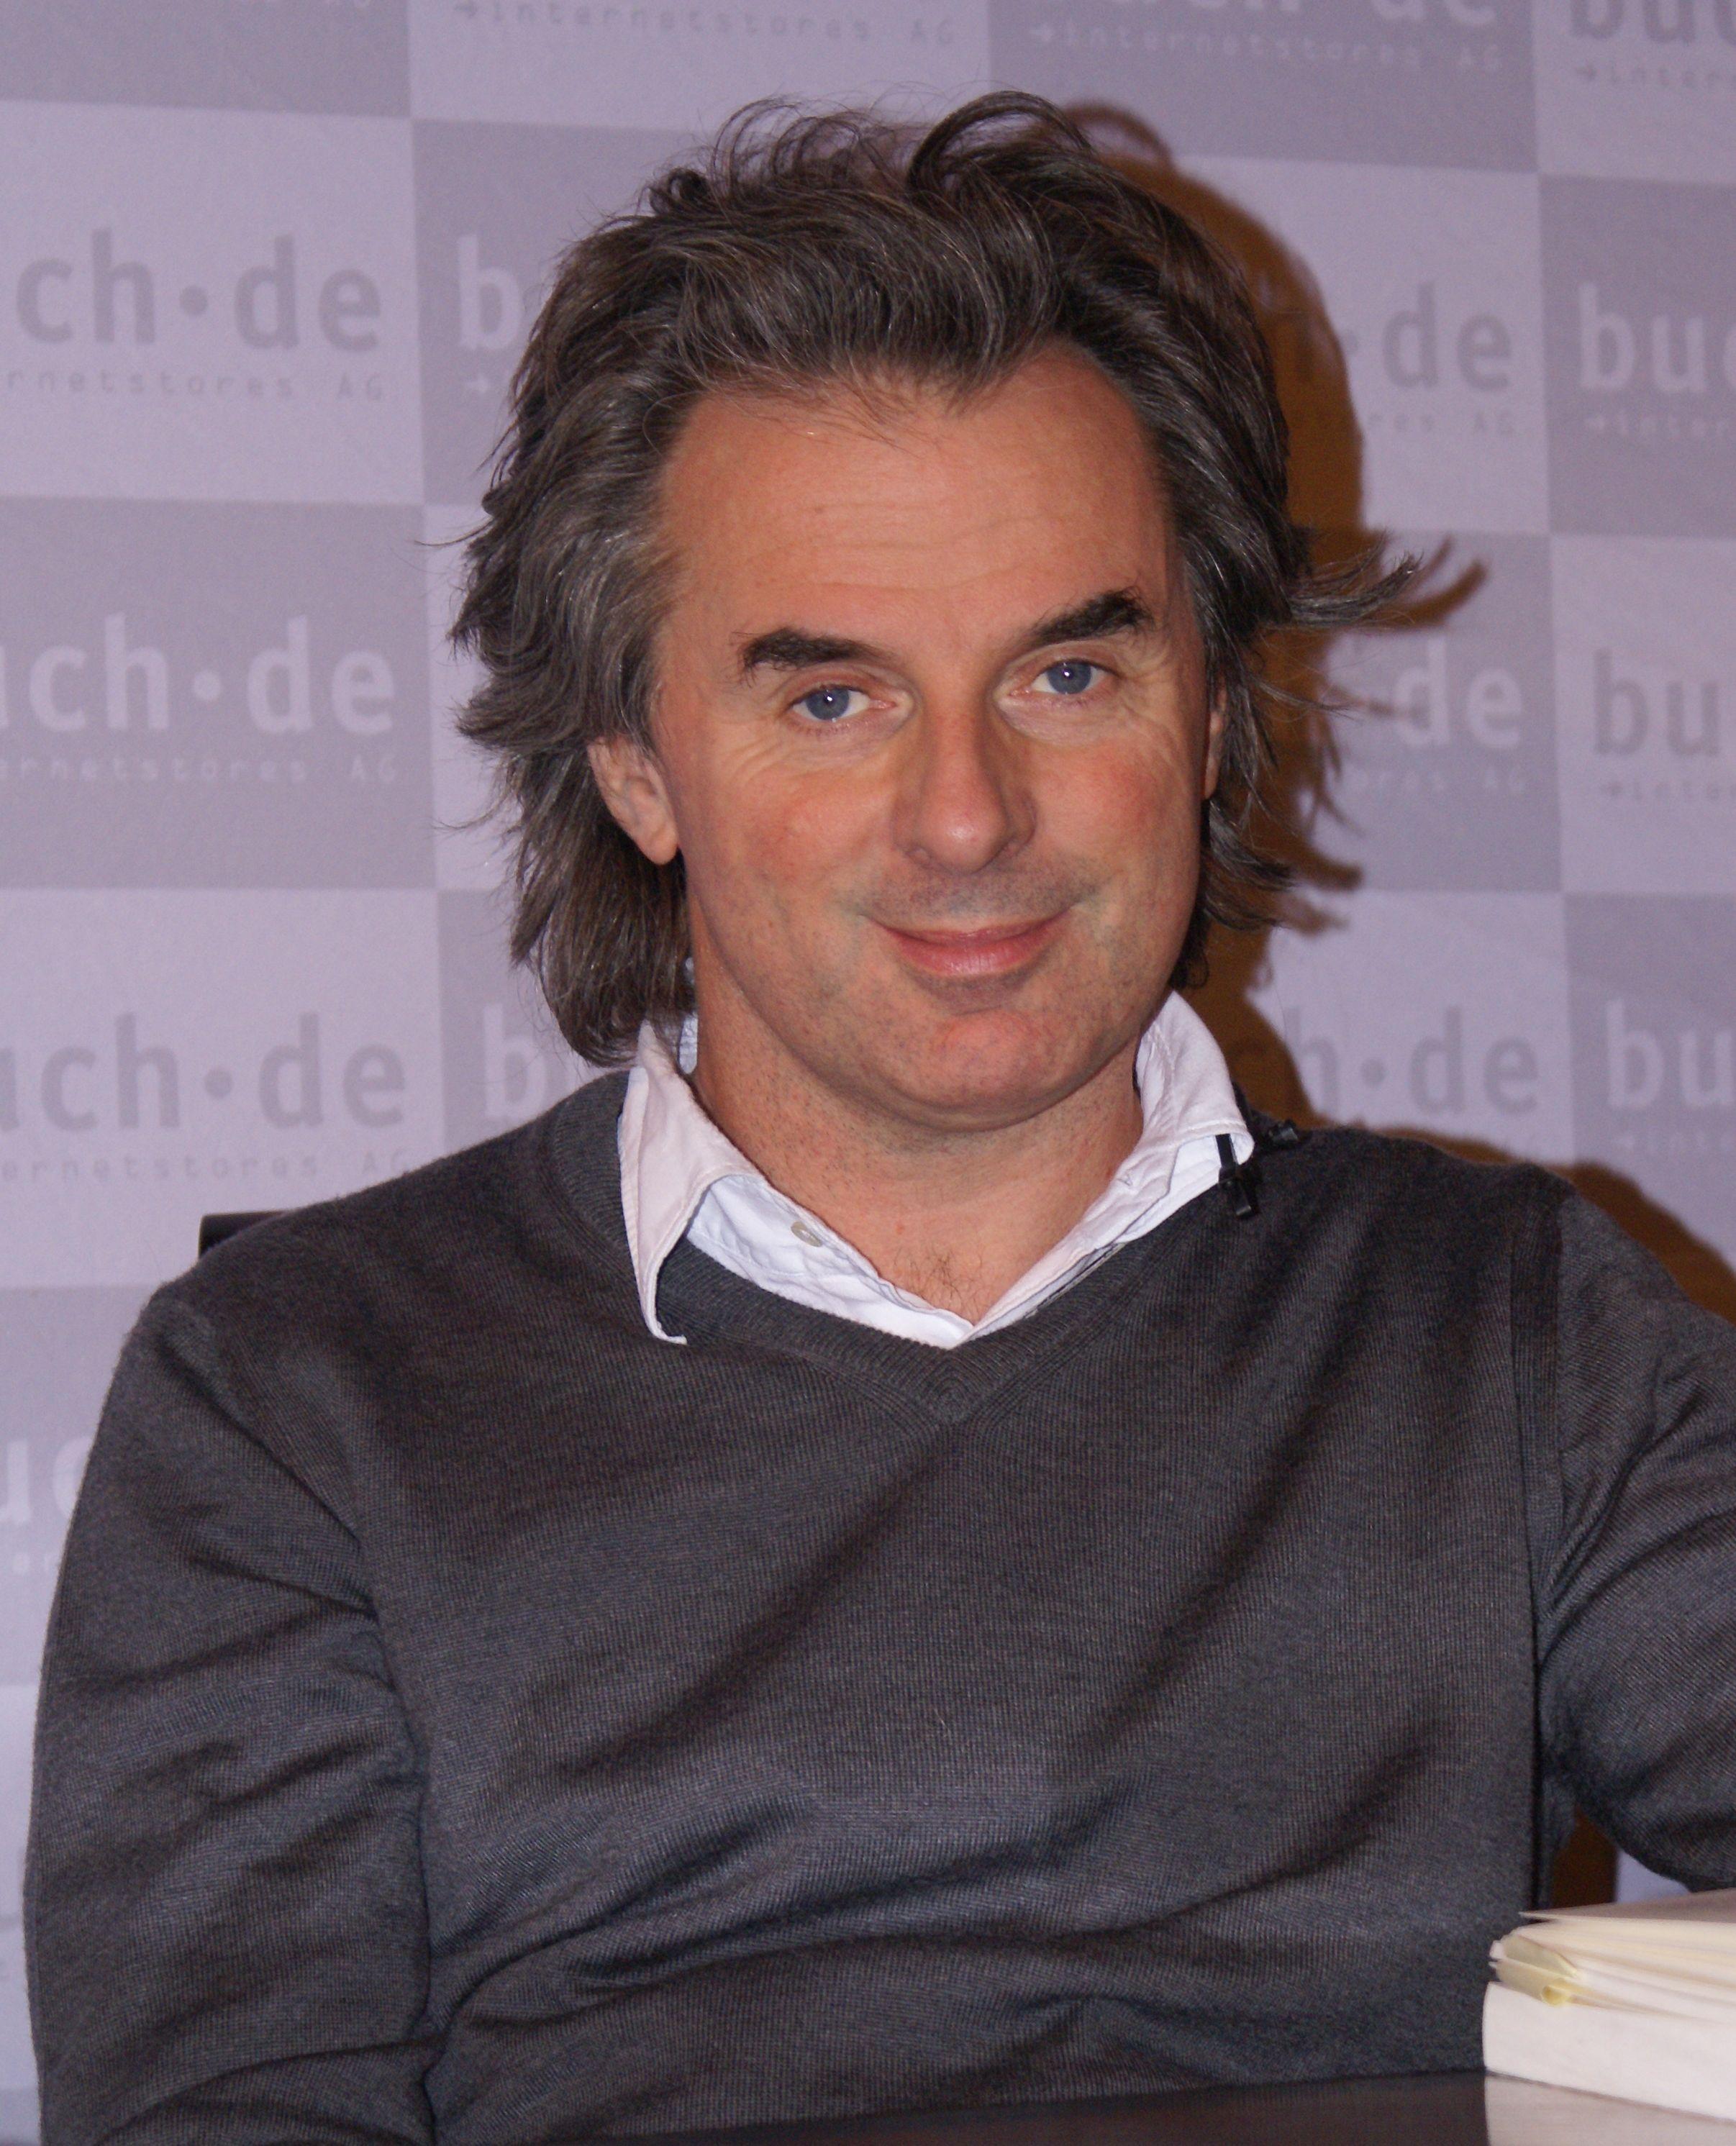 Photo Jean-Christophe Grangé via Opendata BNF